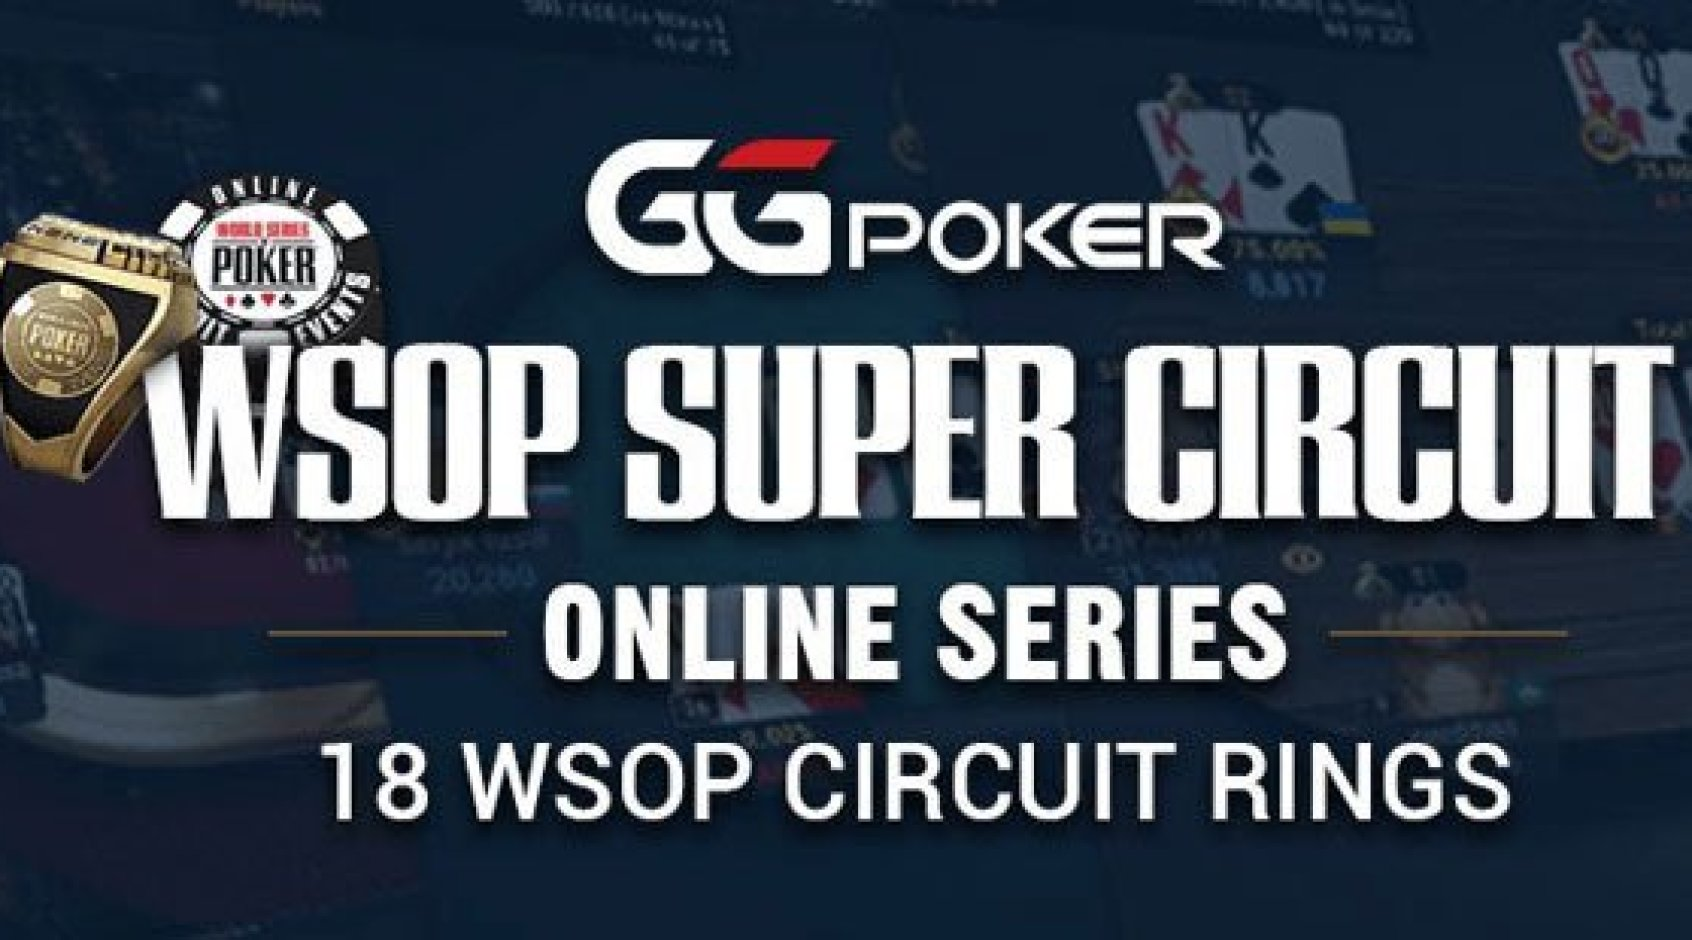 GGPoker и WSOP проведут совместную онлайн серию